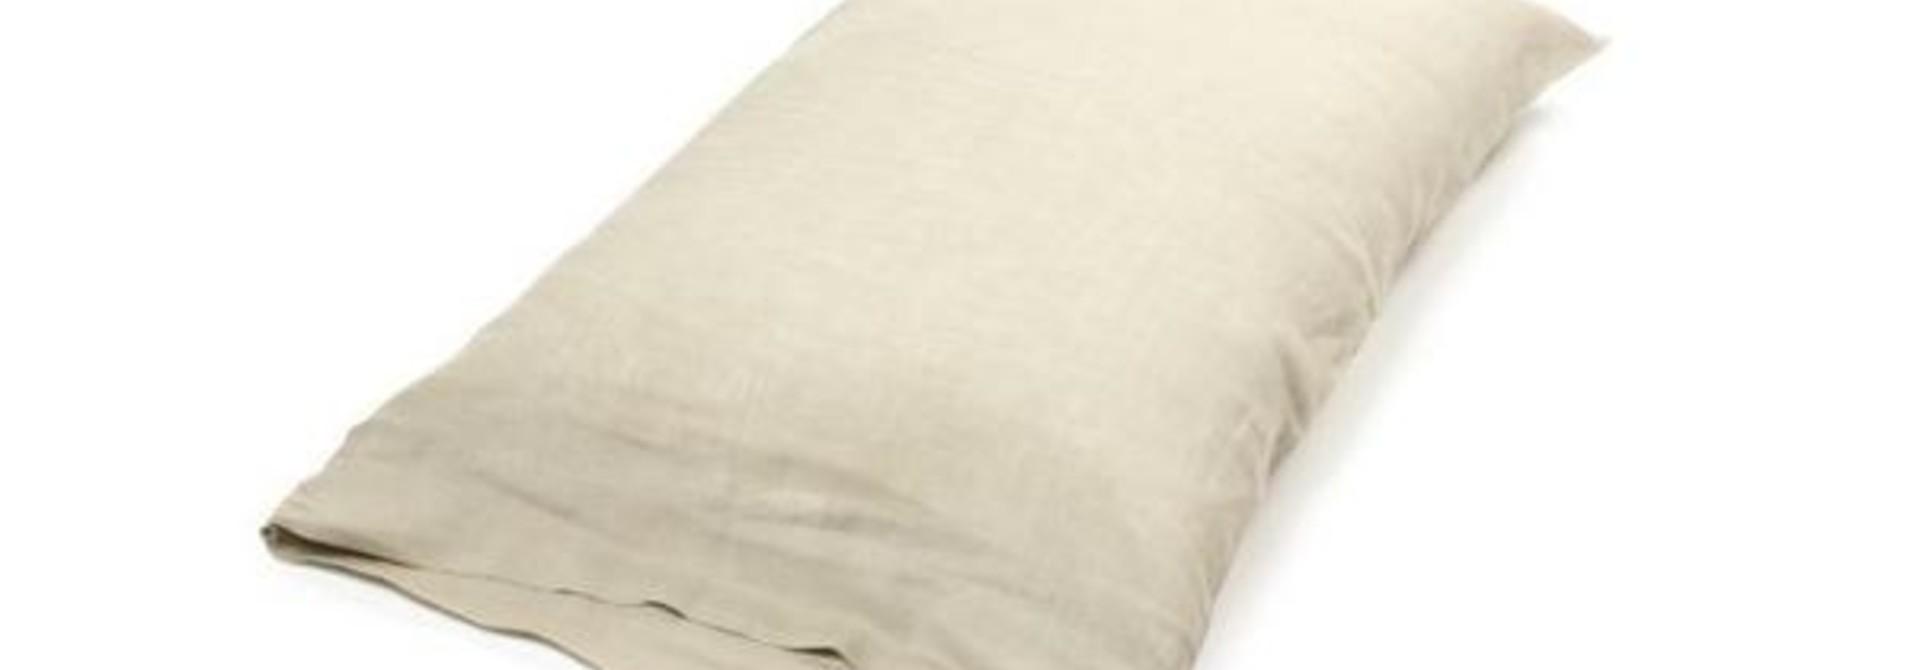 Pillow Sham - Santiago Stone - King (Set of 2)